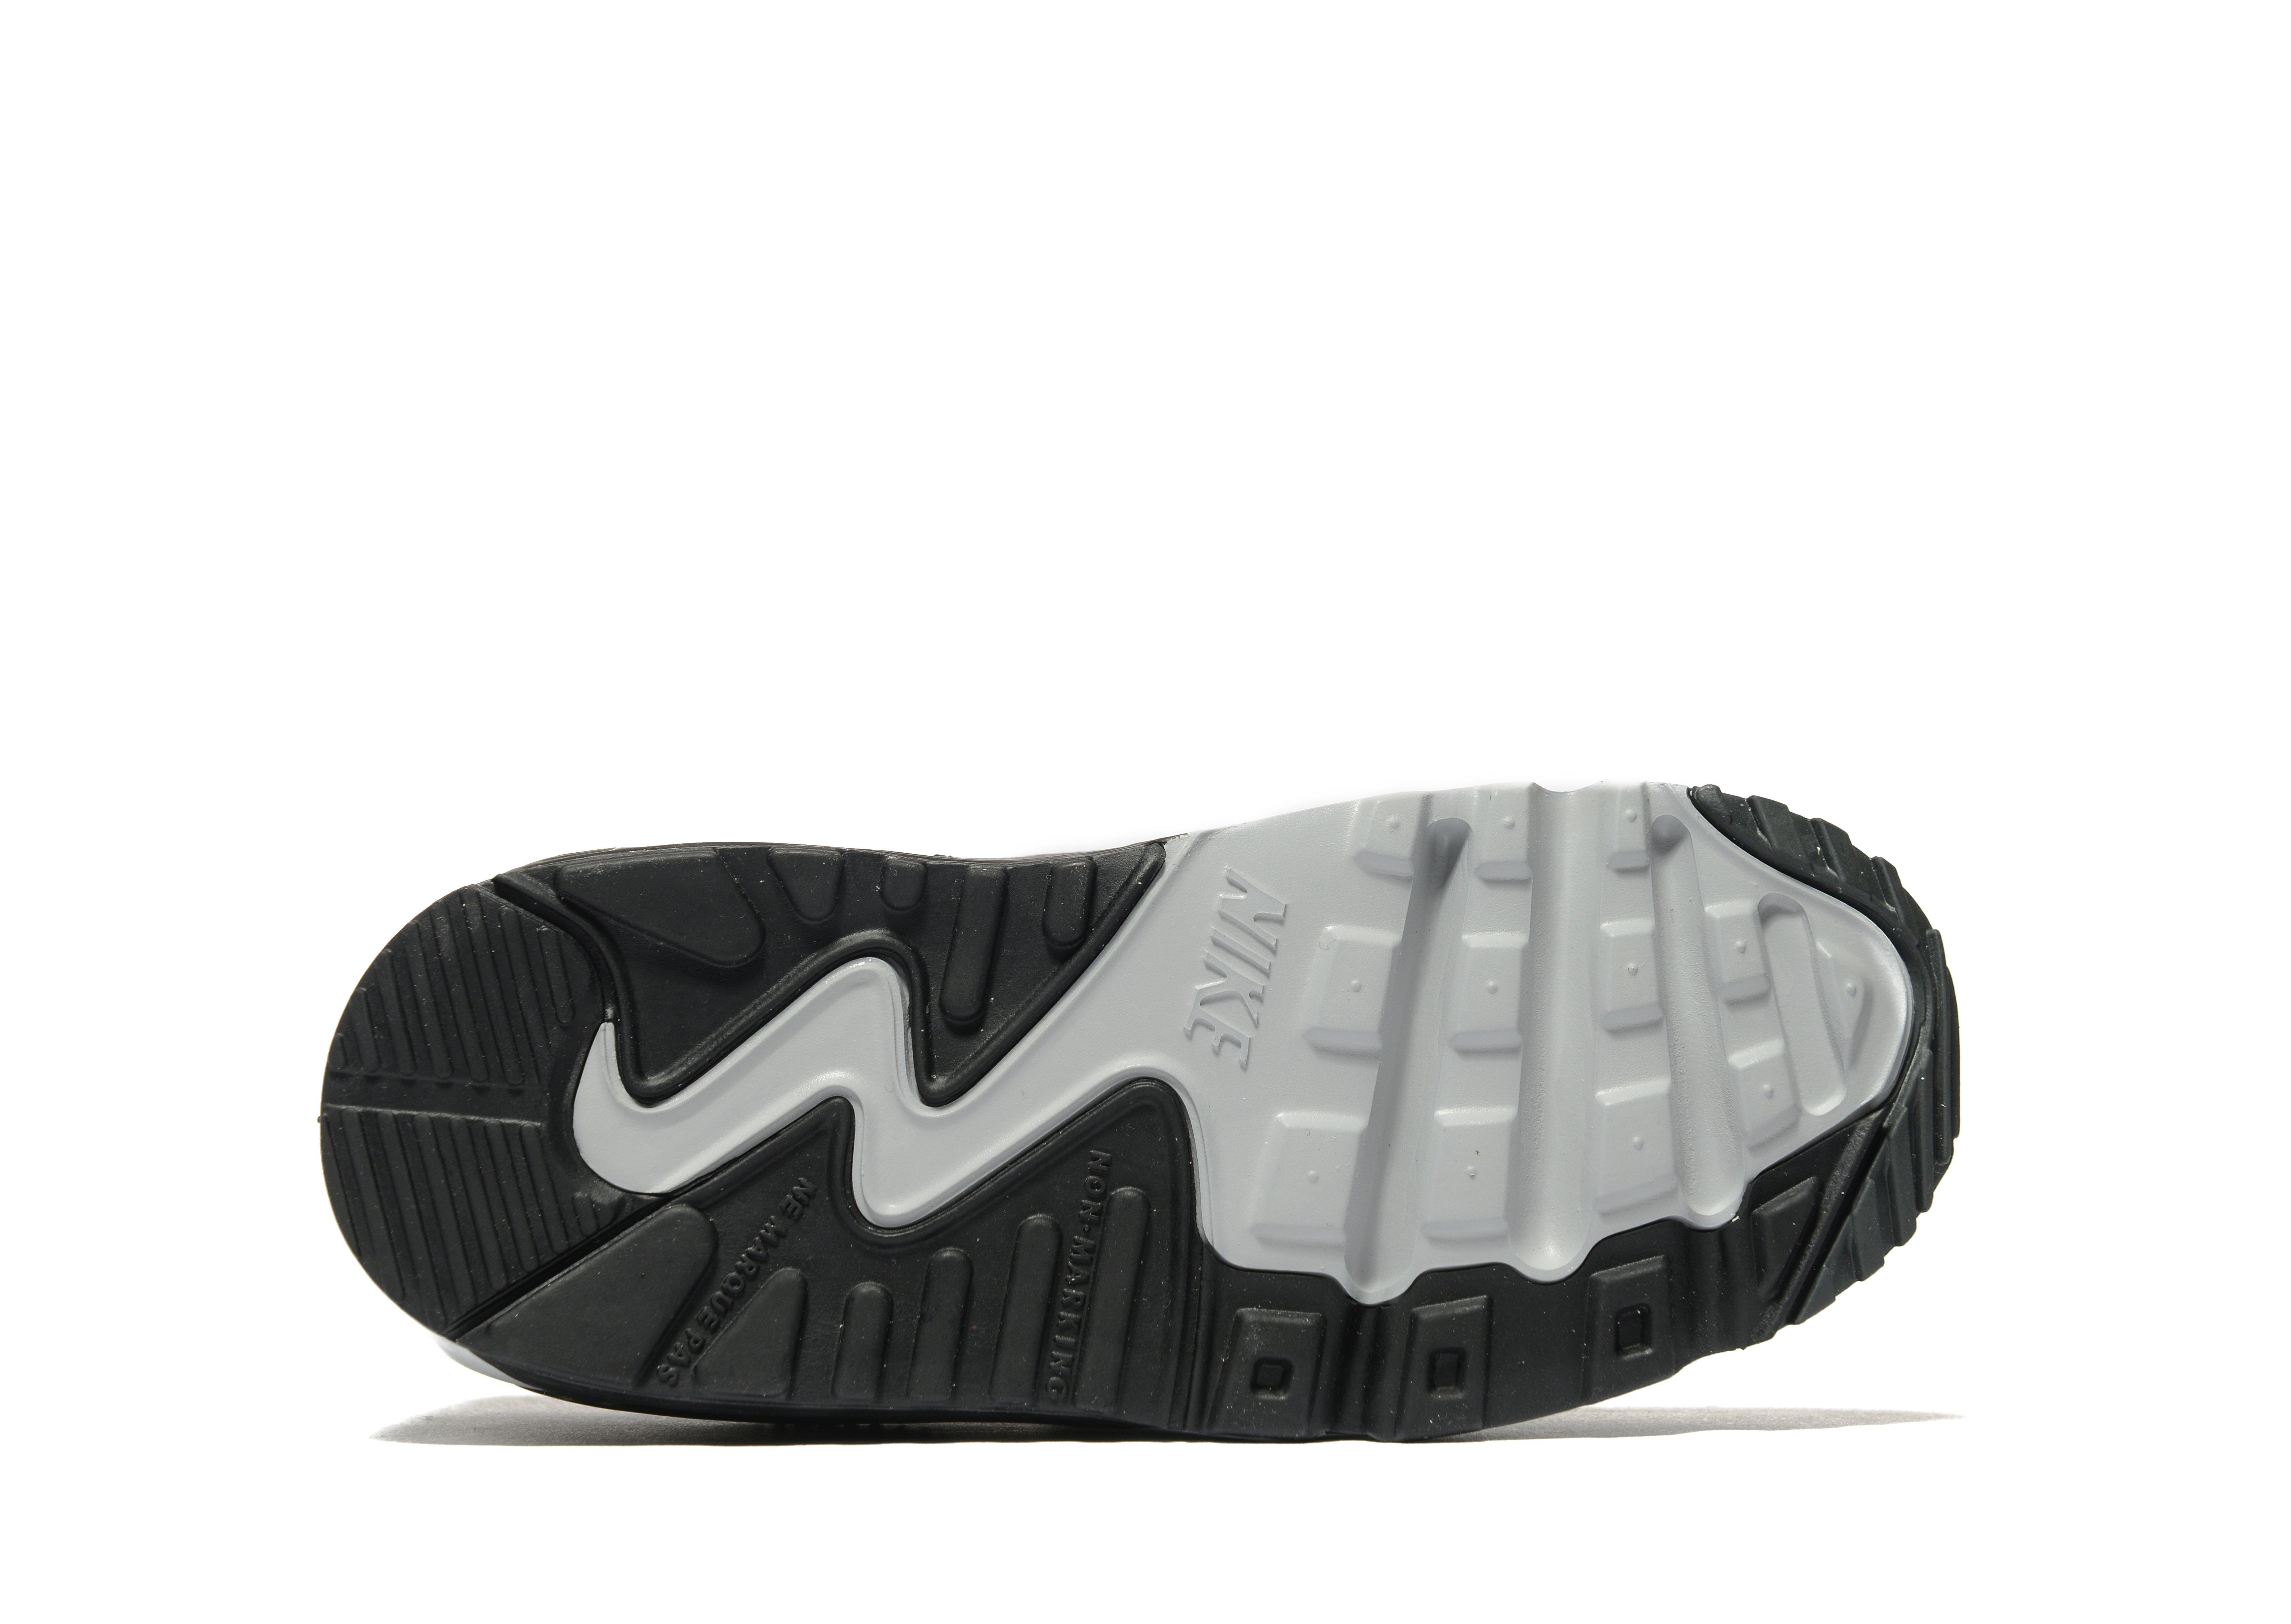 775e1a4bb Nike Roshe Pink Wedge Sneakers Target